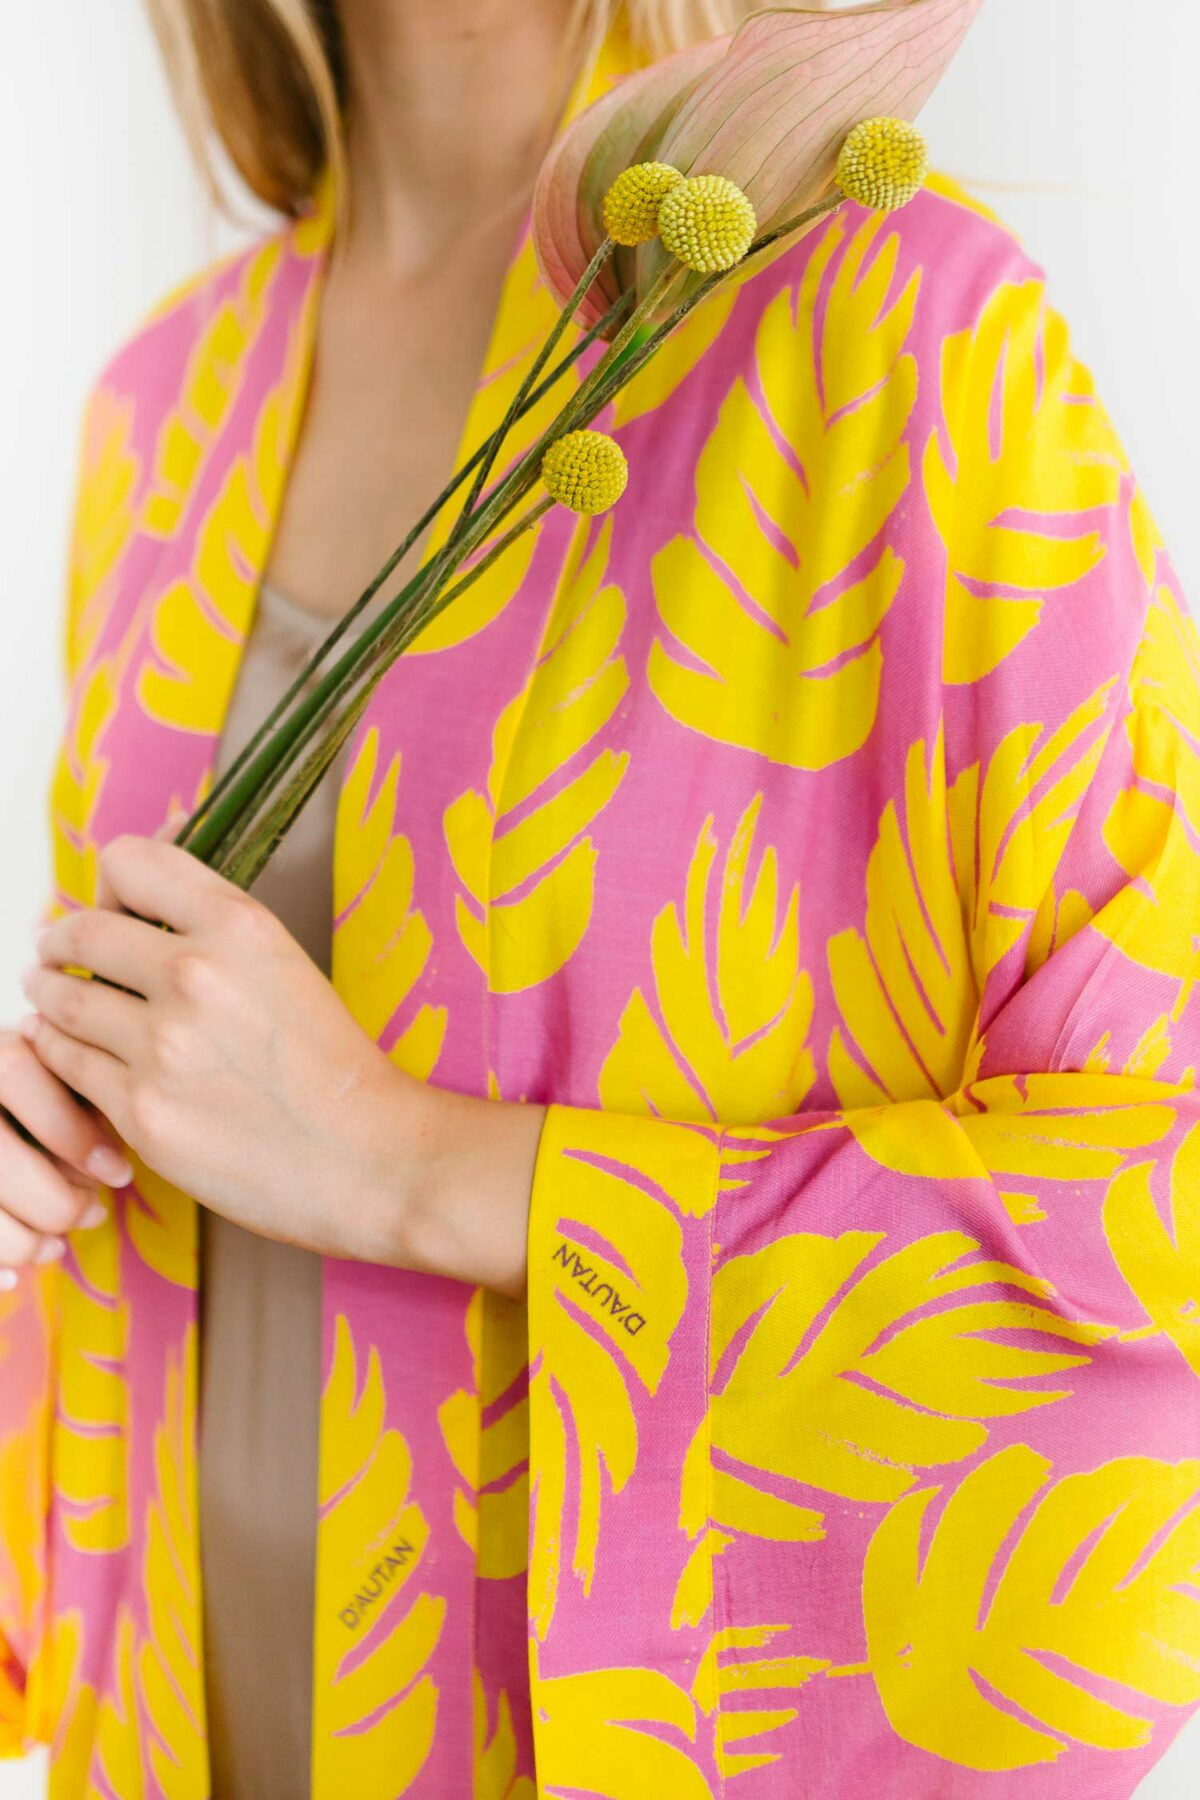 woman with a yellow and pink kimono